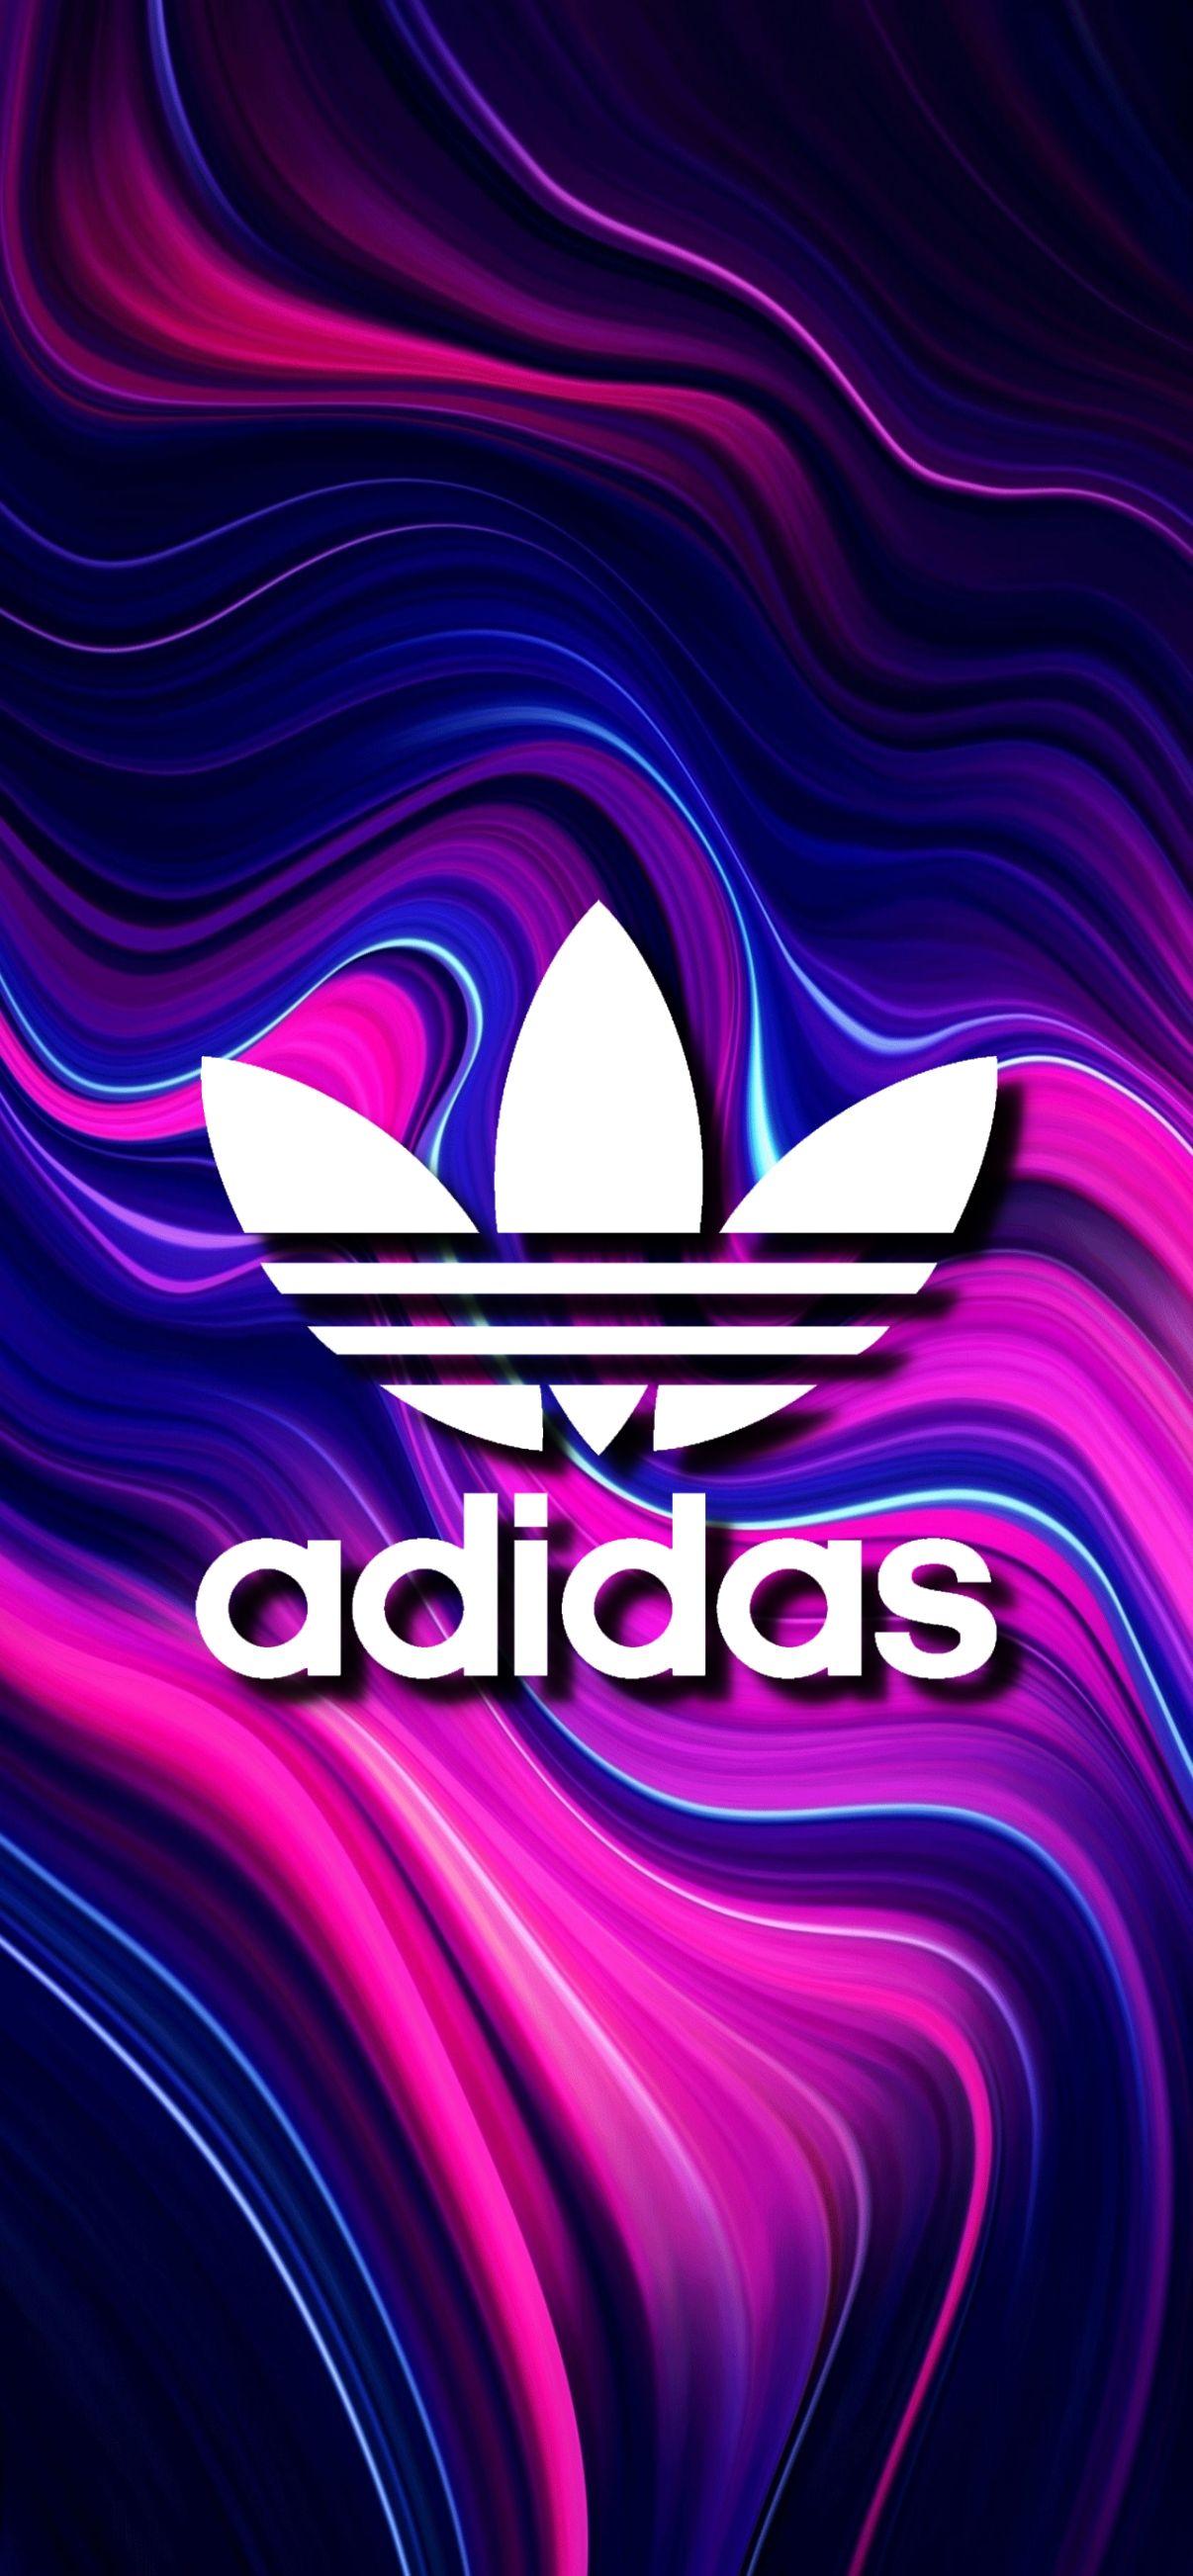 Wallpaper Iphone Adidas Wallpaperize Adidas Iphone Wallpaper Adidas Wallpaper Iphone Adidas Wallpapers